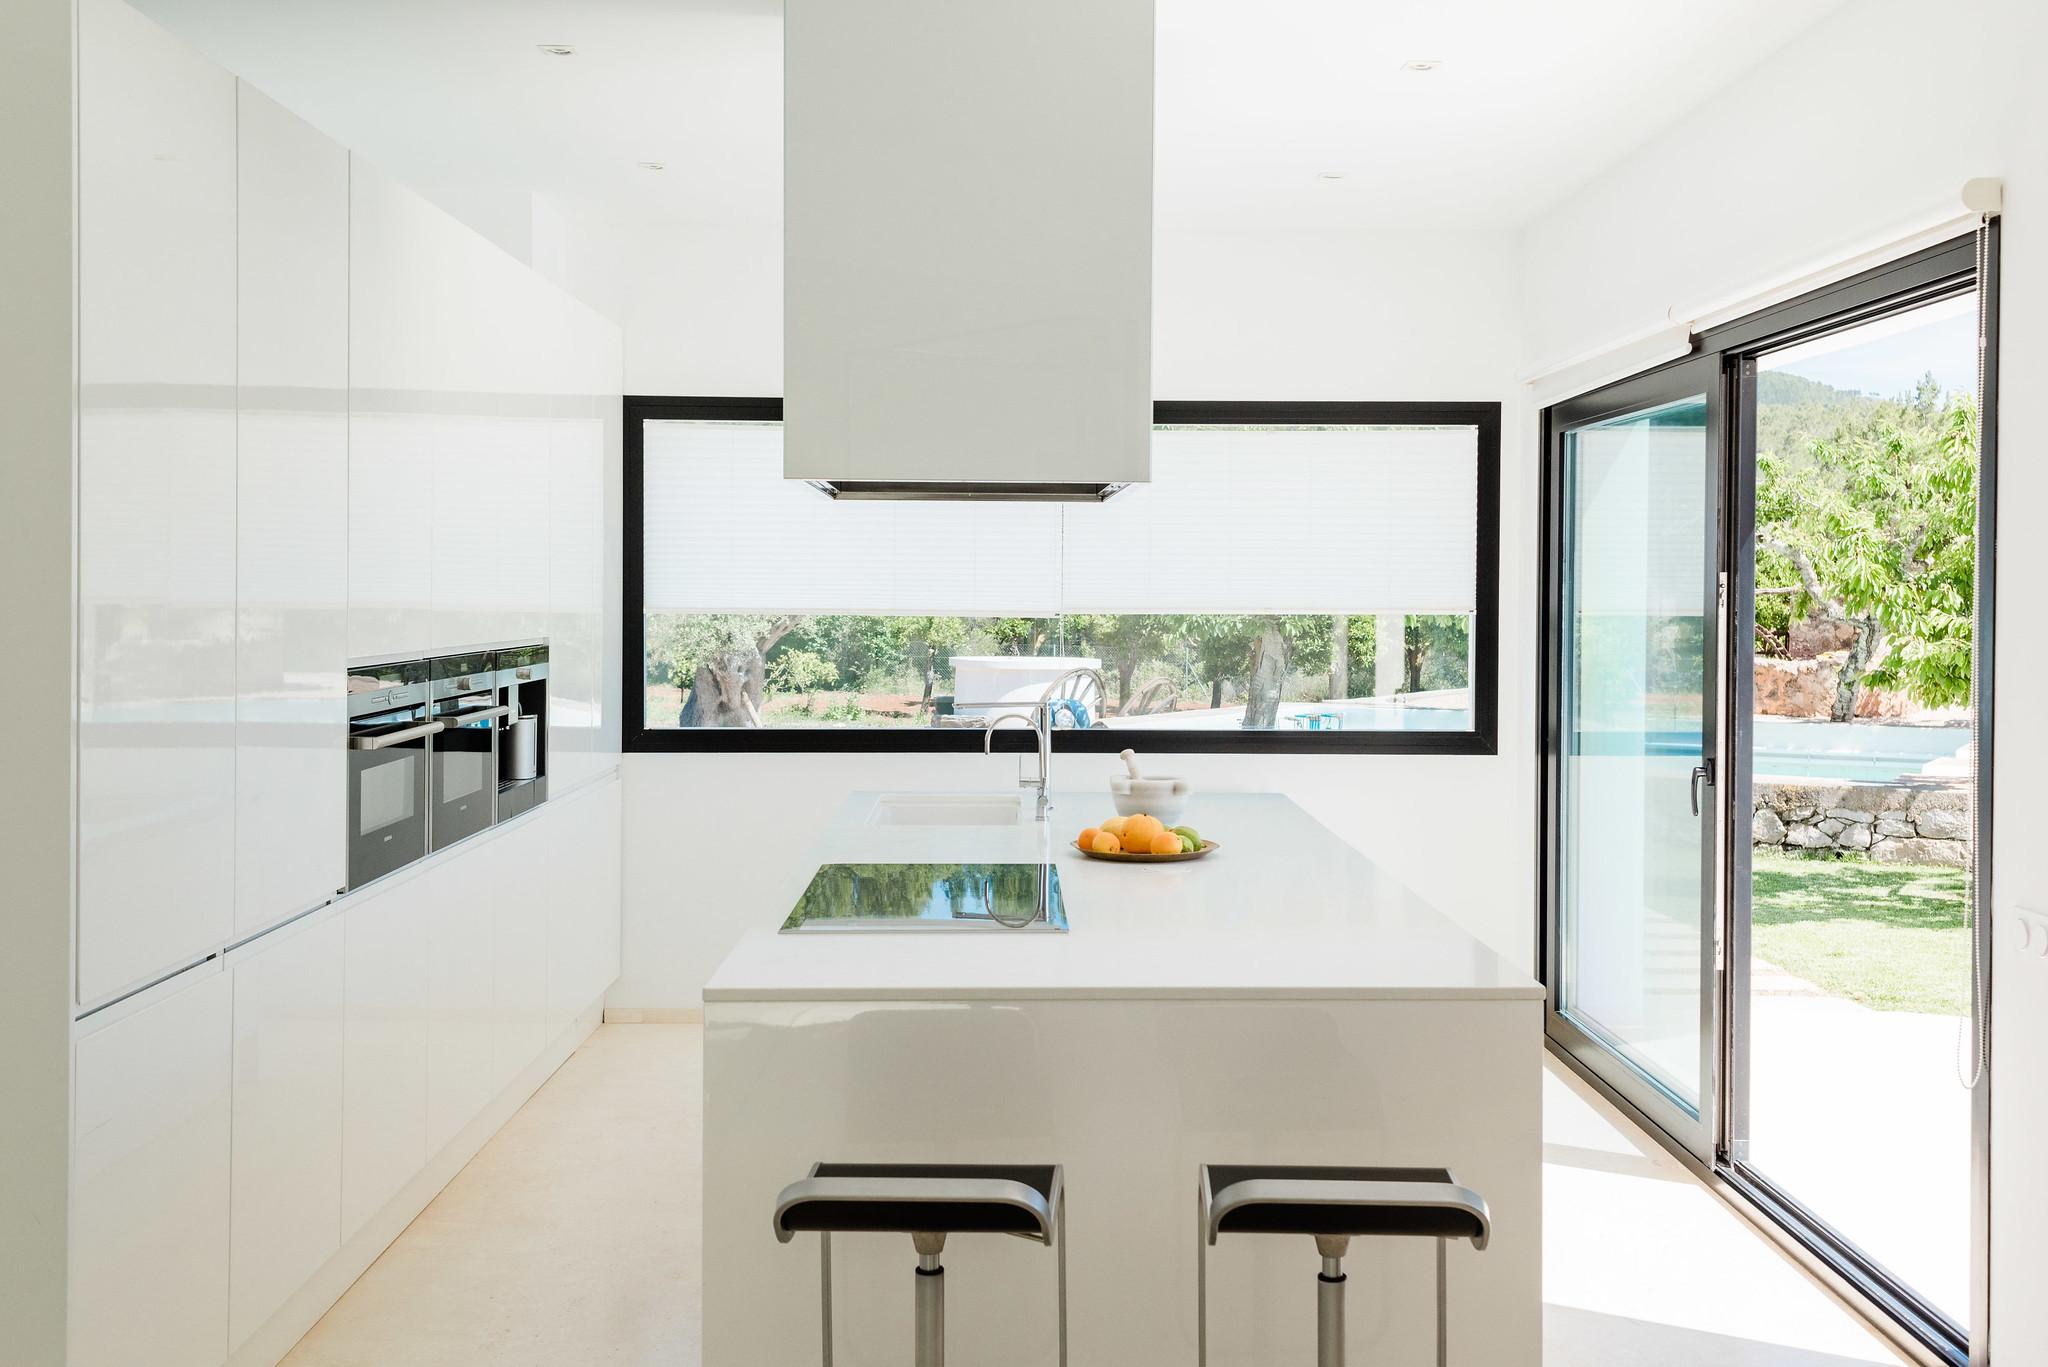 https://www.white-ibiza.com/wp-content/uploads/2020/06/white-ibiza-villas-can-carmen-interior-kitchen3.jpg